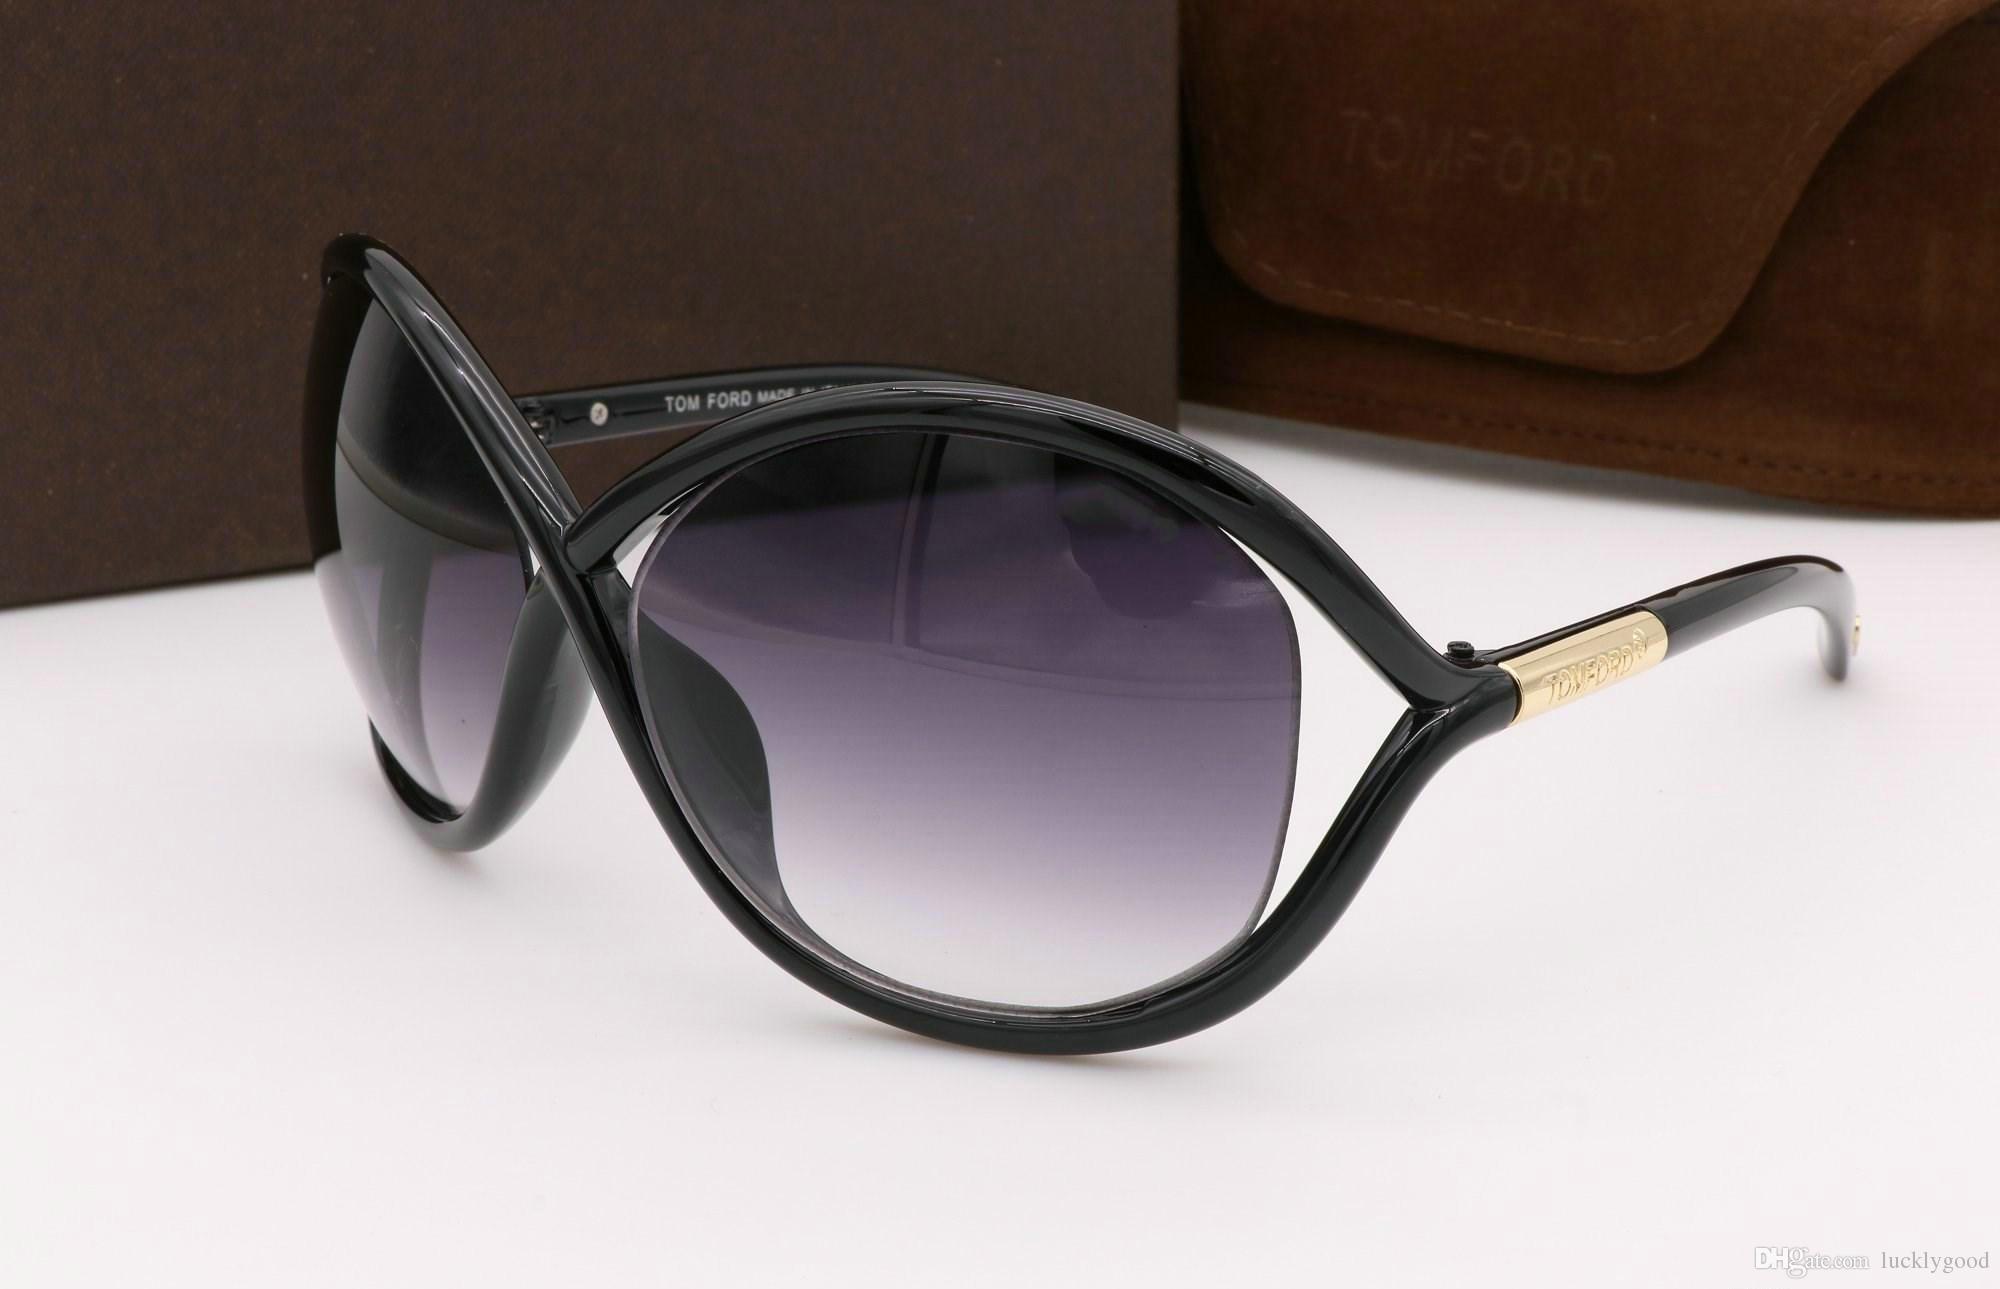 adab2cfdd5 Top Quality New Fashion Tom 0394 Sunglasses Ford Man Woman Erika ...